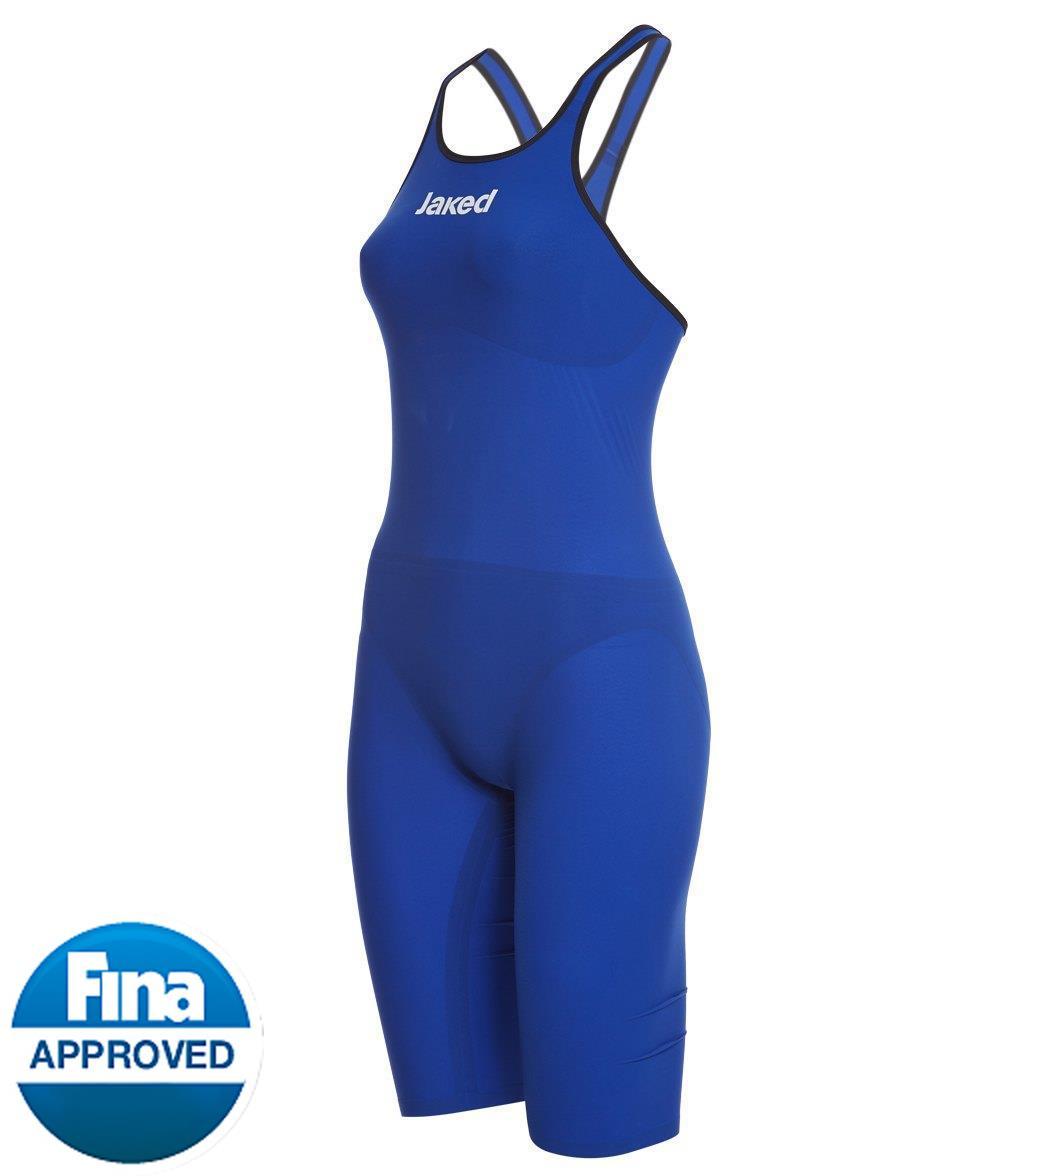 ce484ecd16 Jaked Women's Jkatana Closed Back Tech Suit Swimsuit at SwimOutlet ...